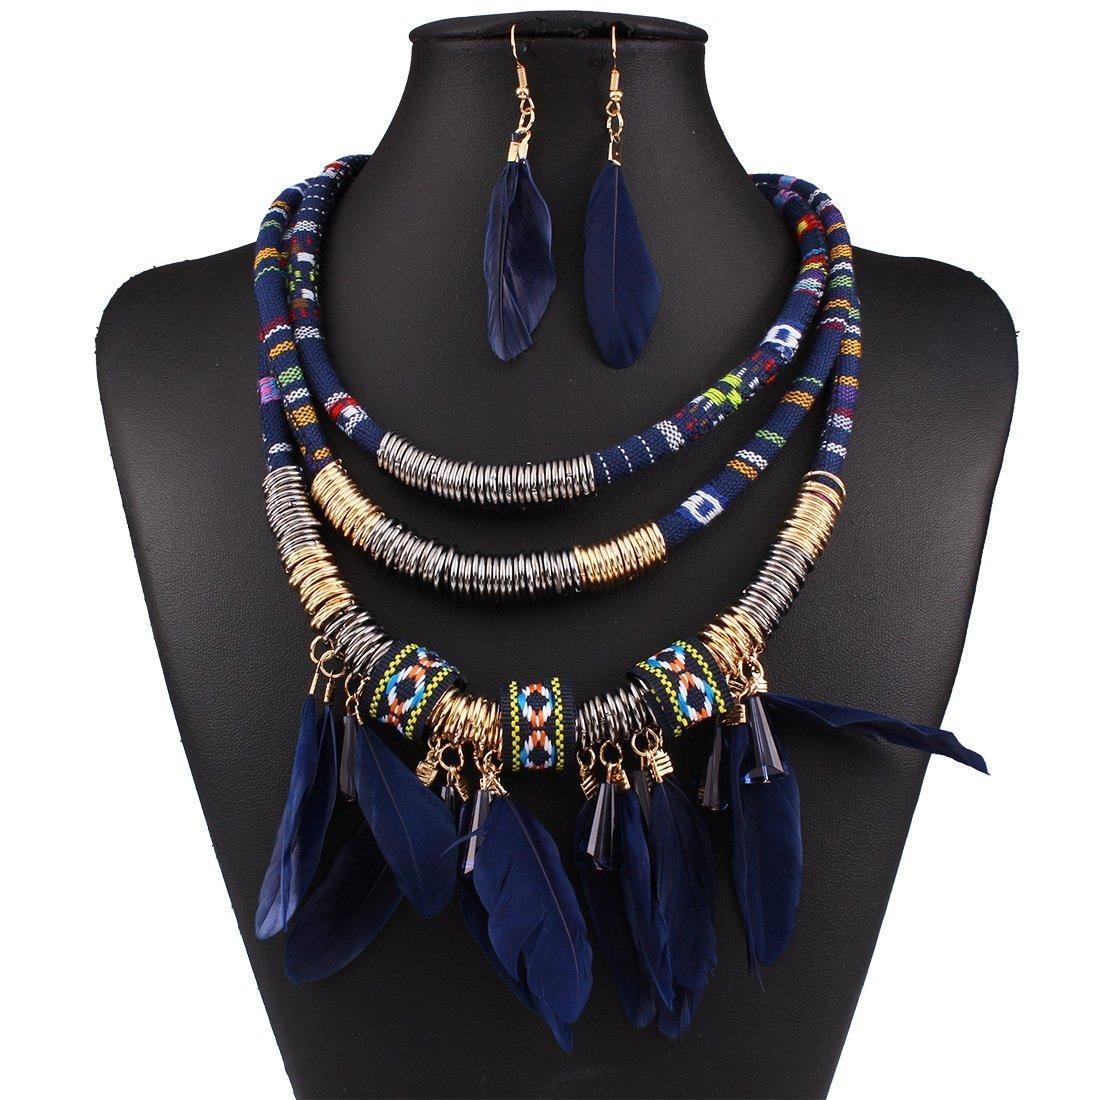 ARICO Feather 18k Gold Jewelry Sets Tassel Jewelry Set Chain Ruby Jewelry Parure Bijoux Femme Multi Layer Necklace Earrings NE884